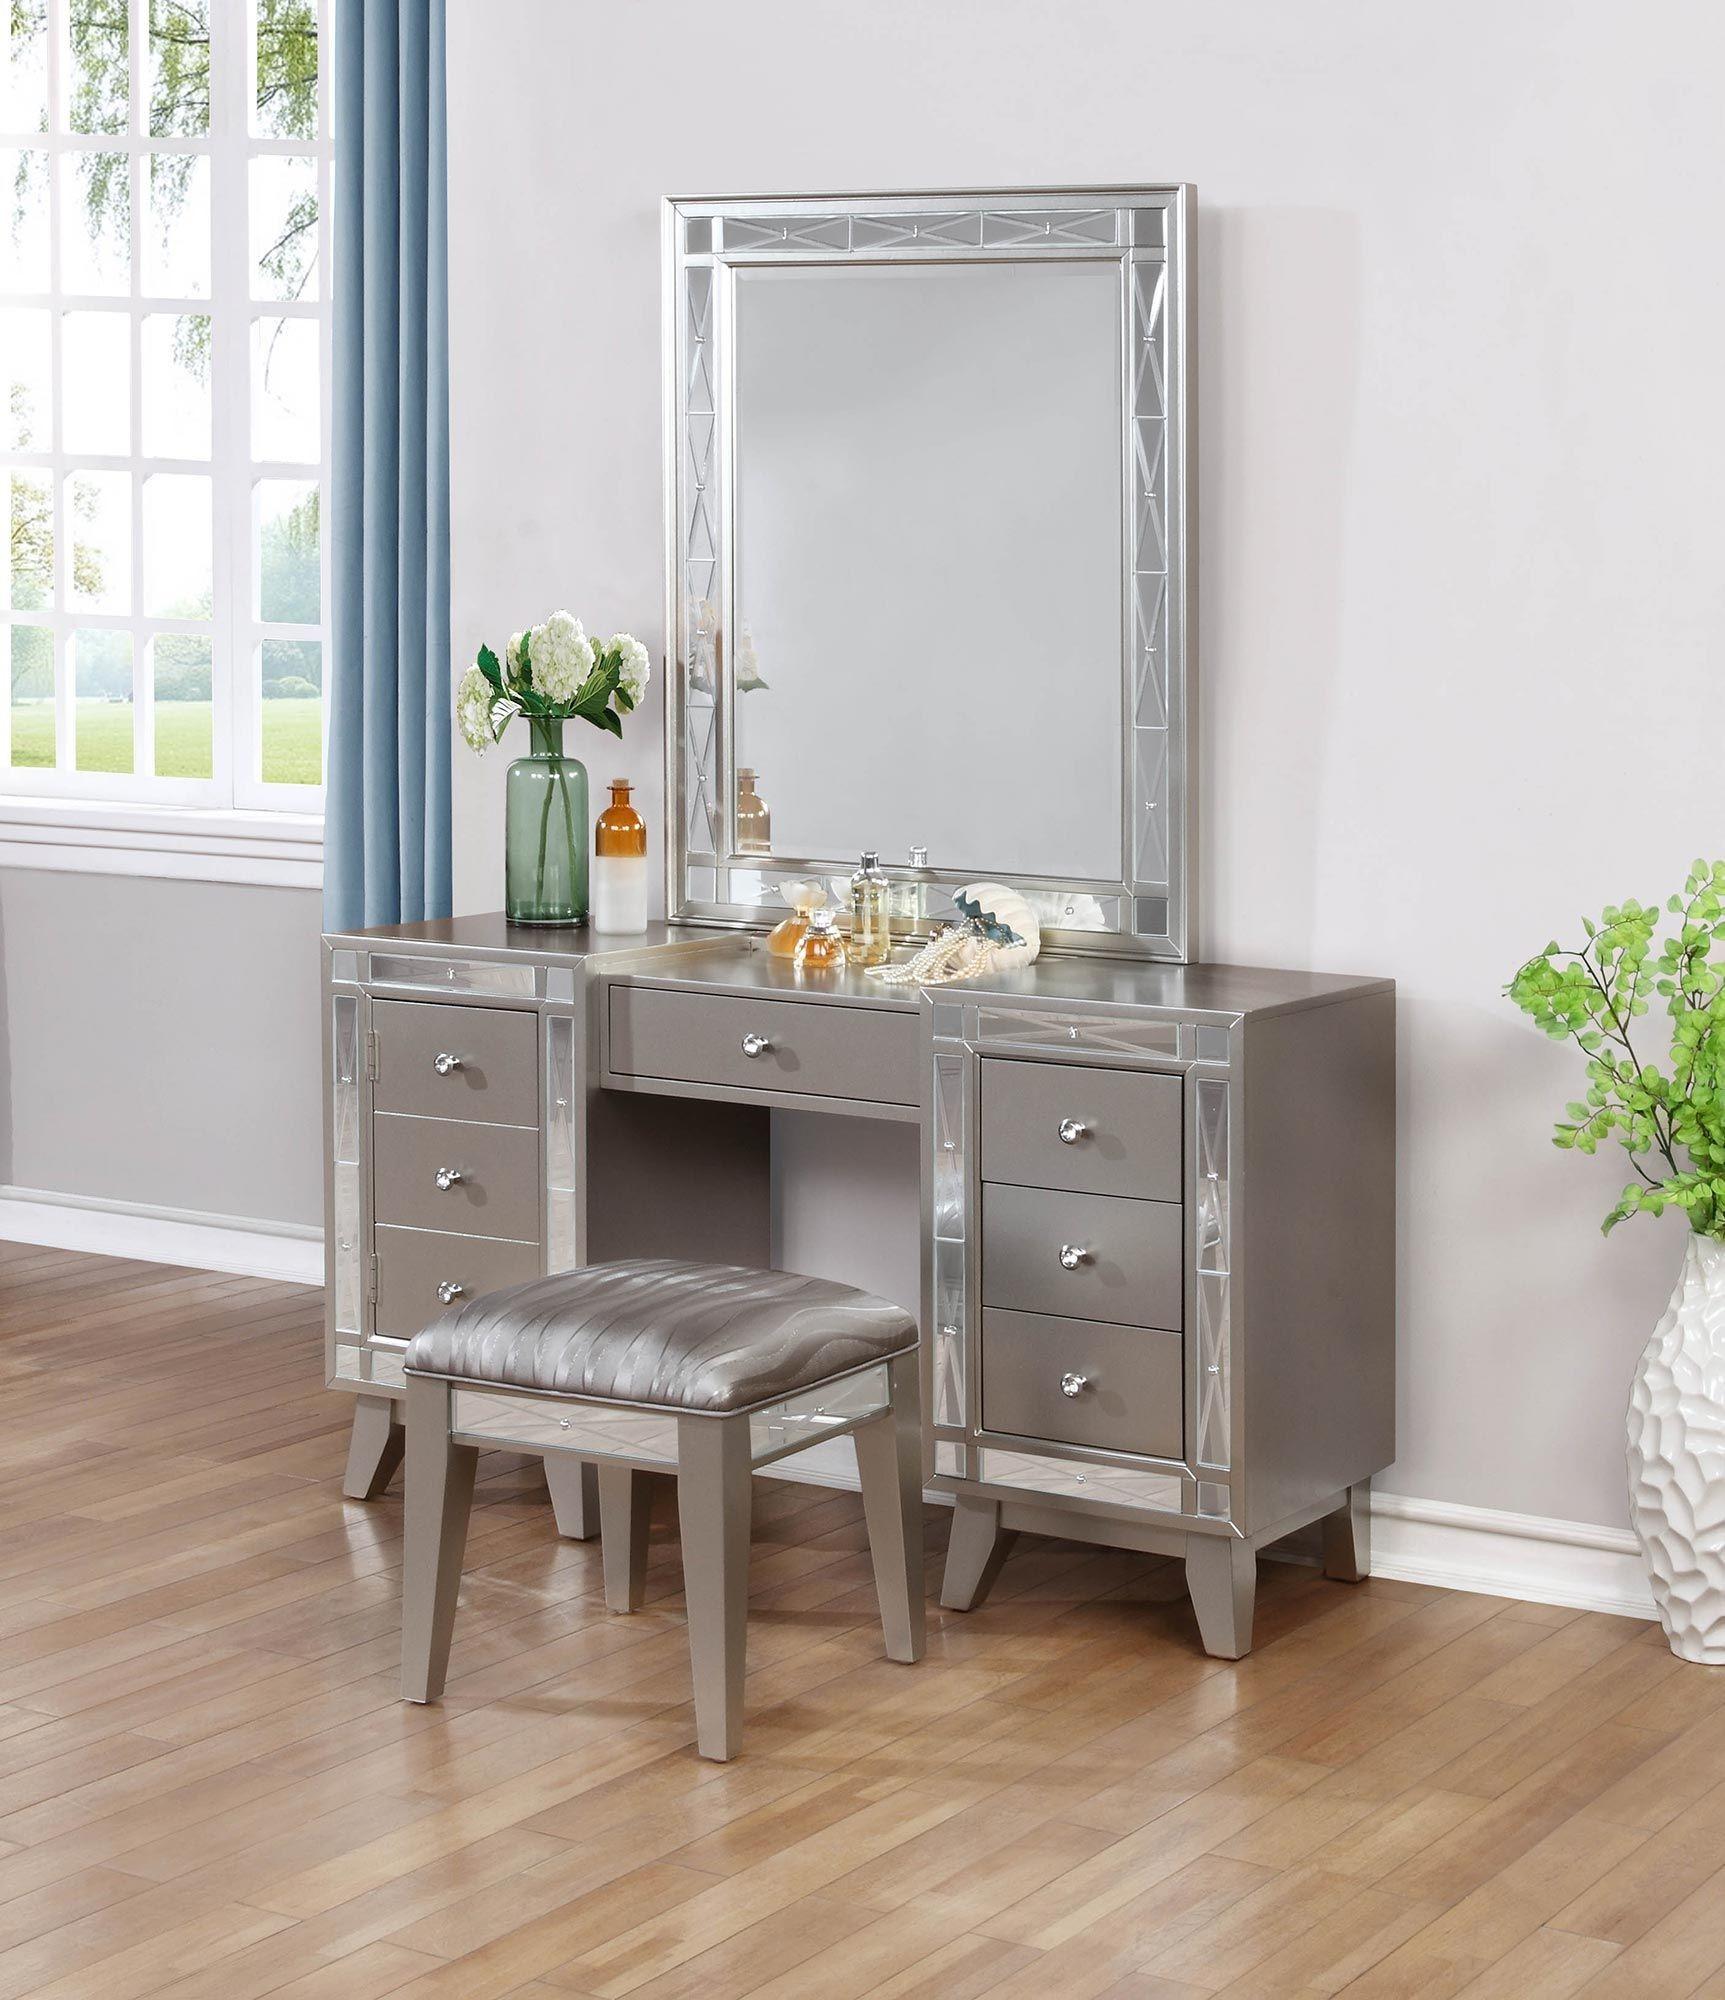 leighton metallic mercury twin panel bed 204921t coaster